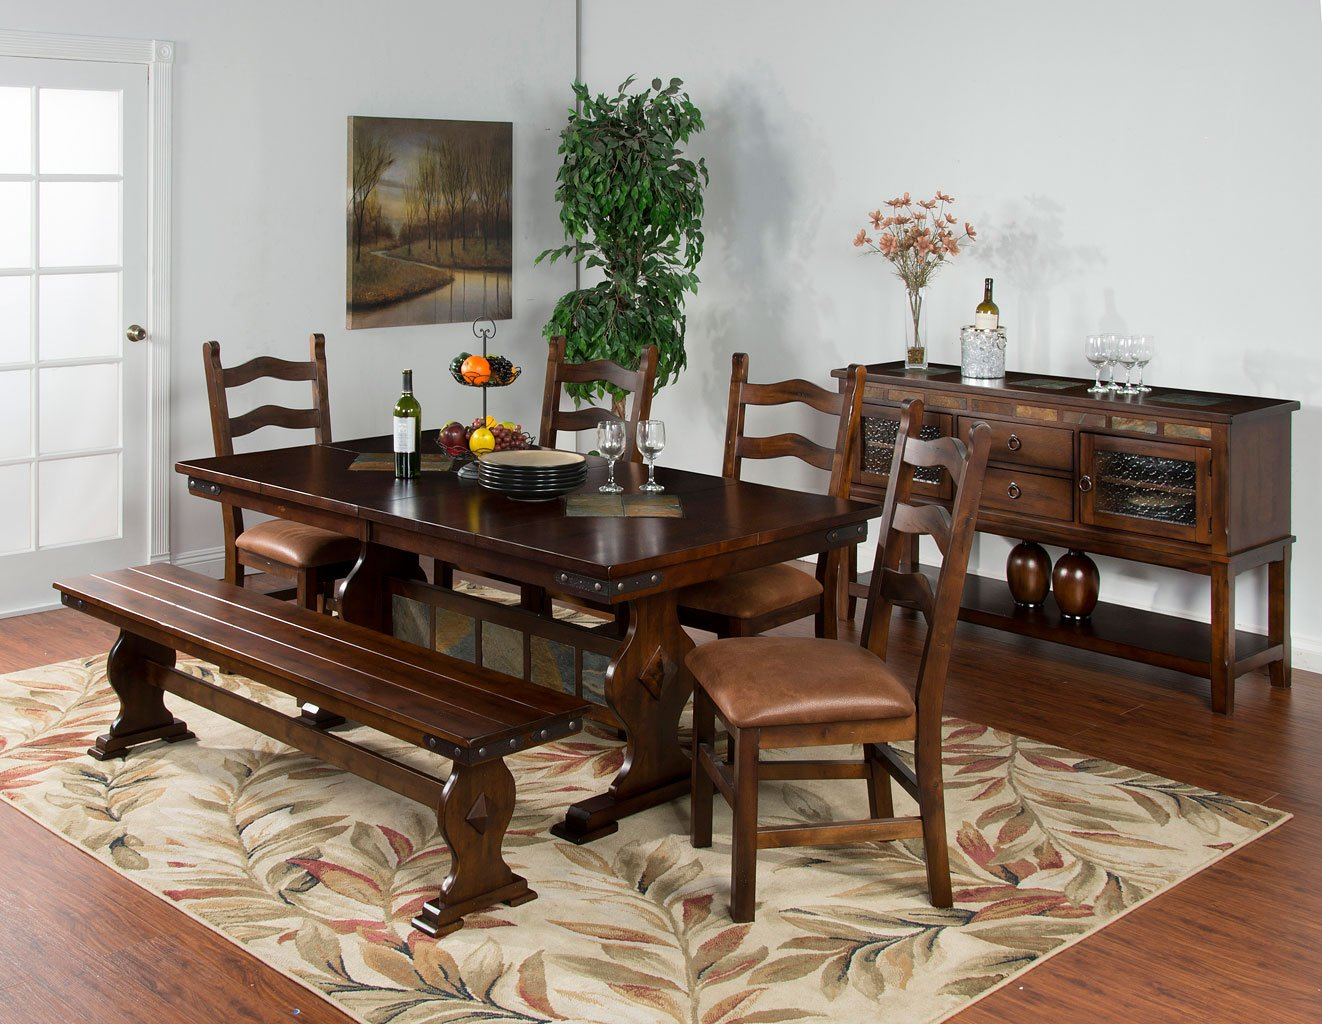 Santa Fe Rectangular Dining Set W/ Ladderback Chairs